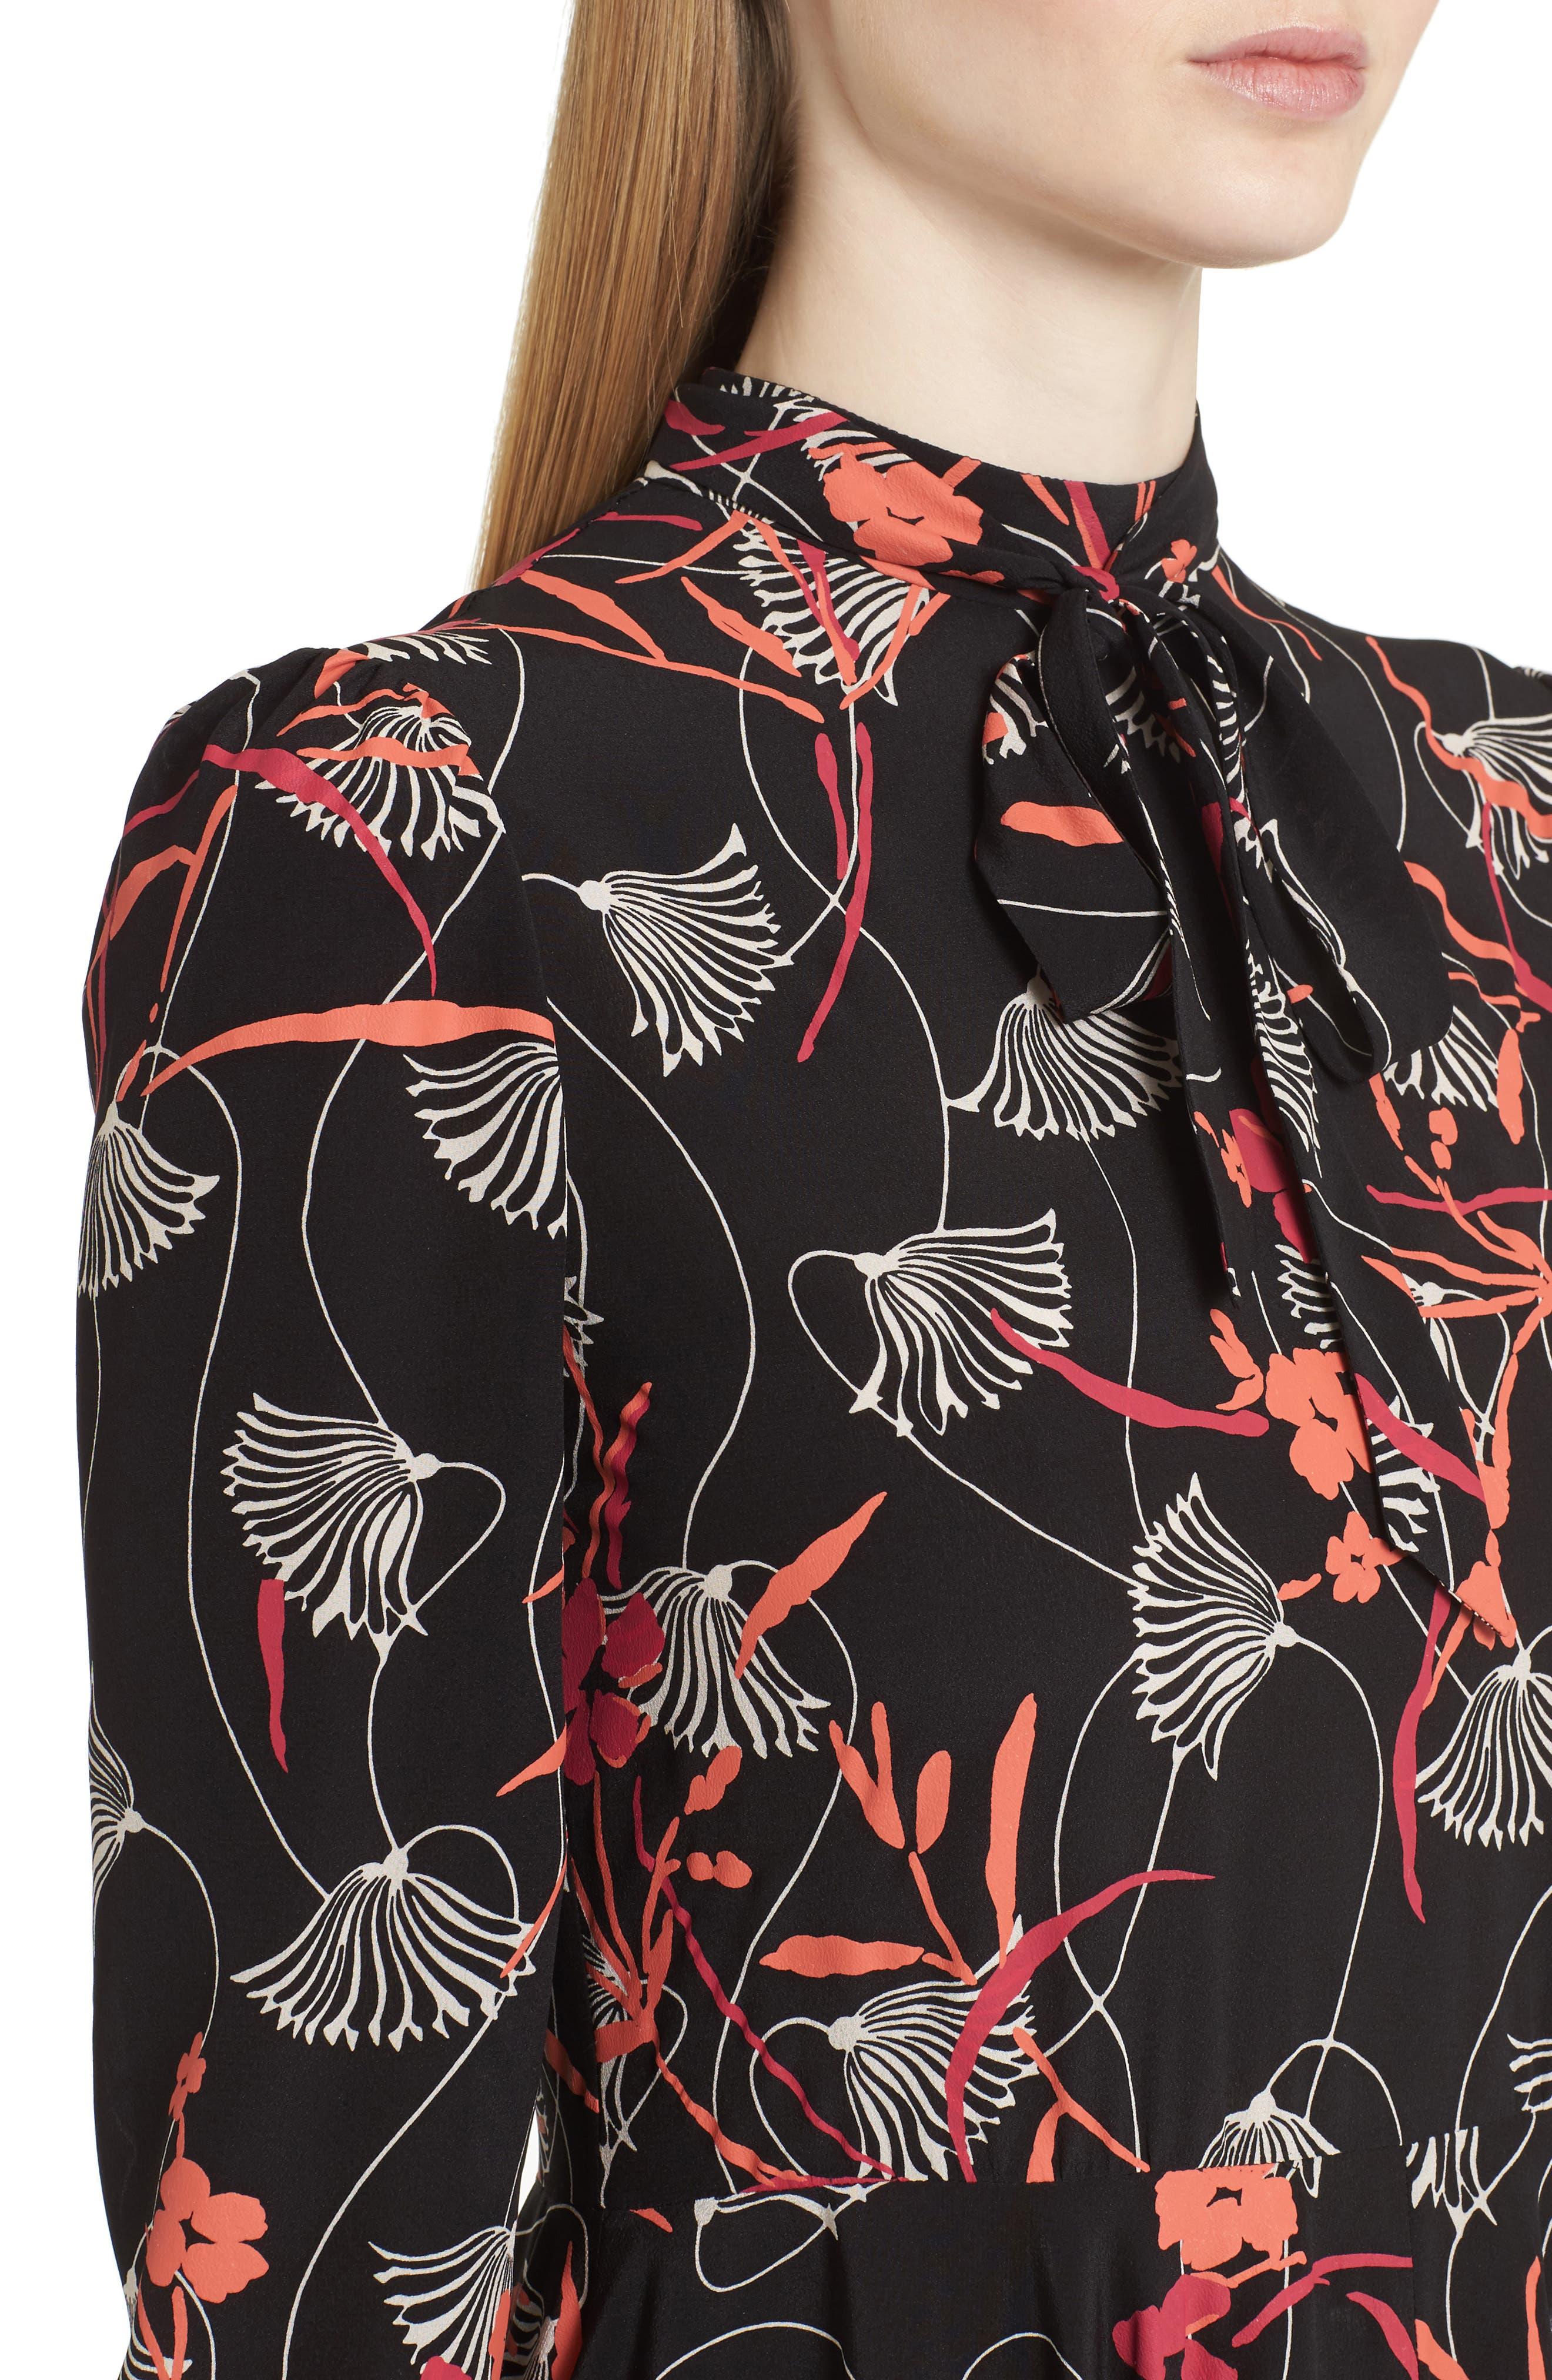 Lotus Print Tie Neck Dress,                             Alternate thumbnail 4, color,                             001